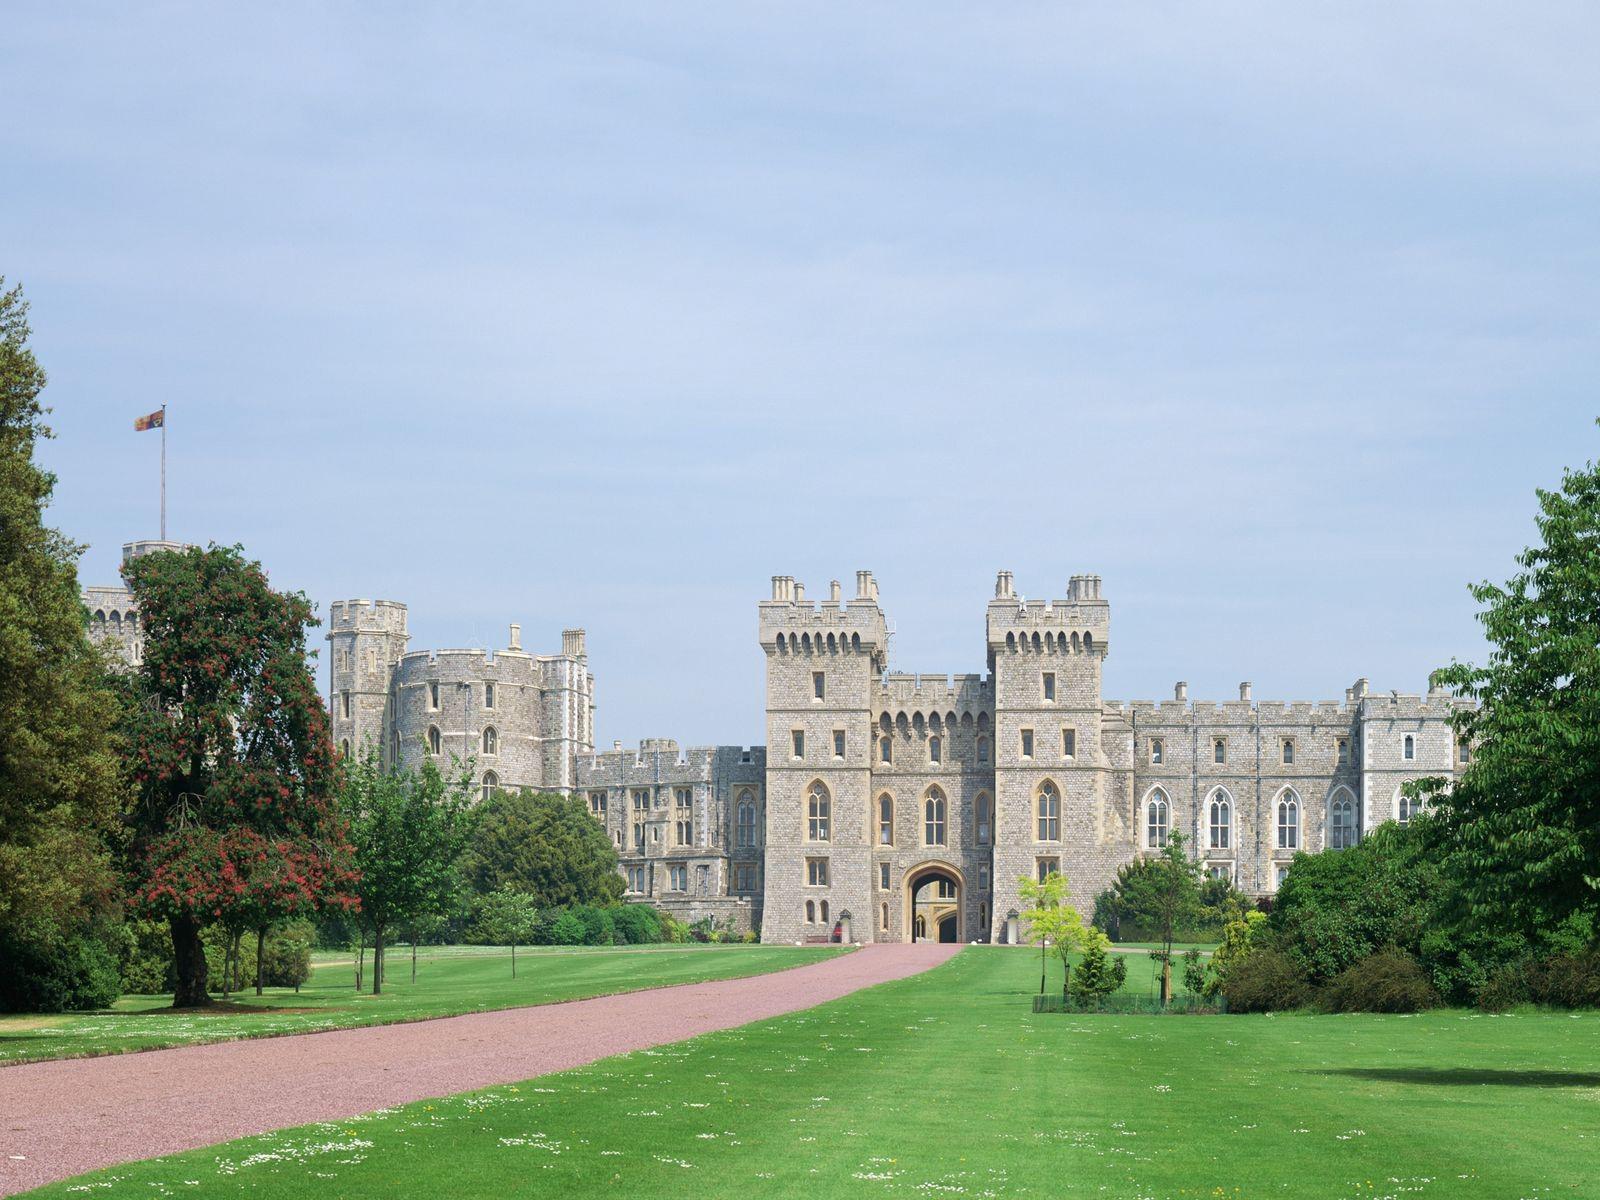 Windsor Castle Wallpapers HD Wallpapers 1600x1200